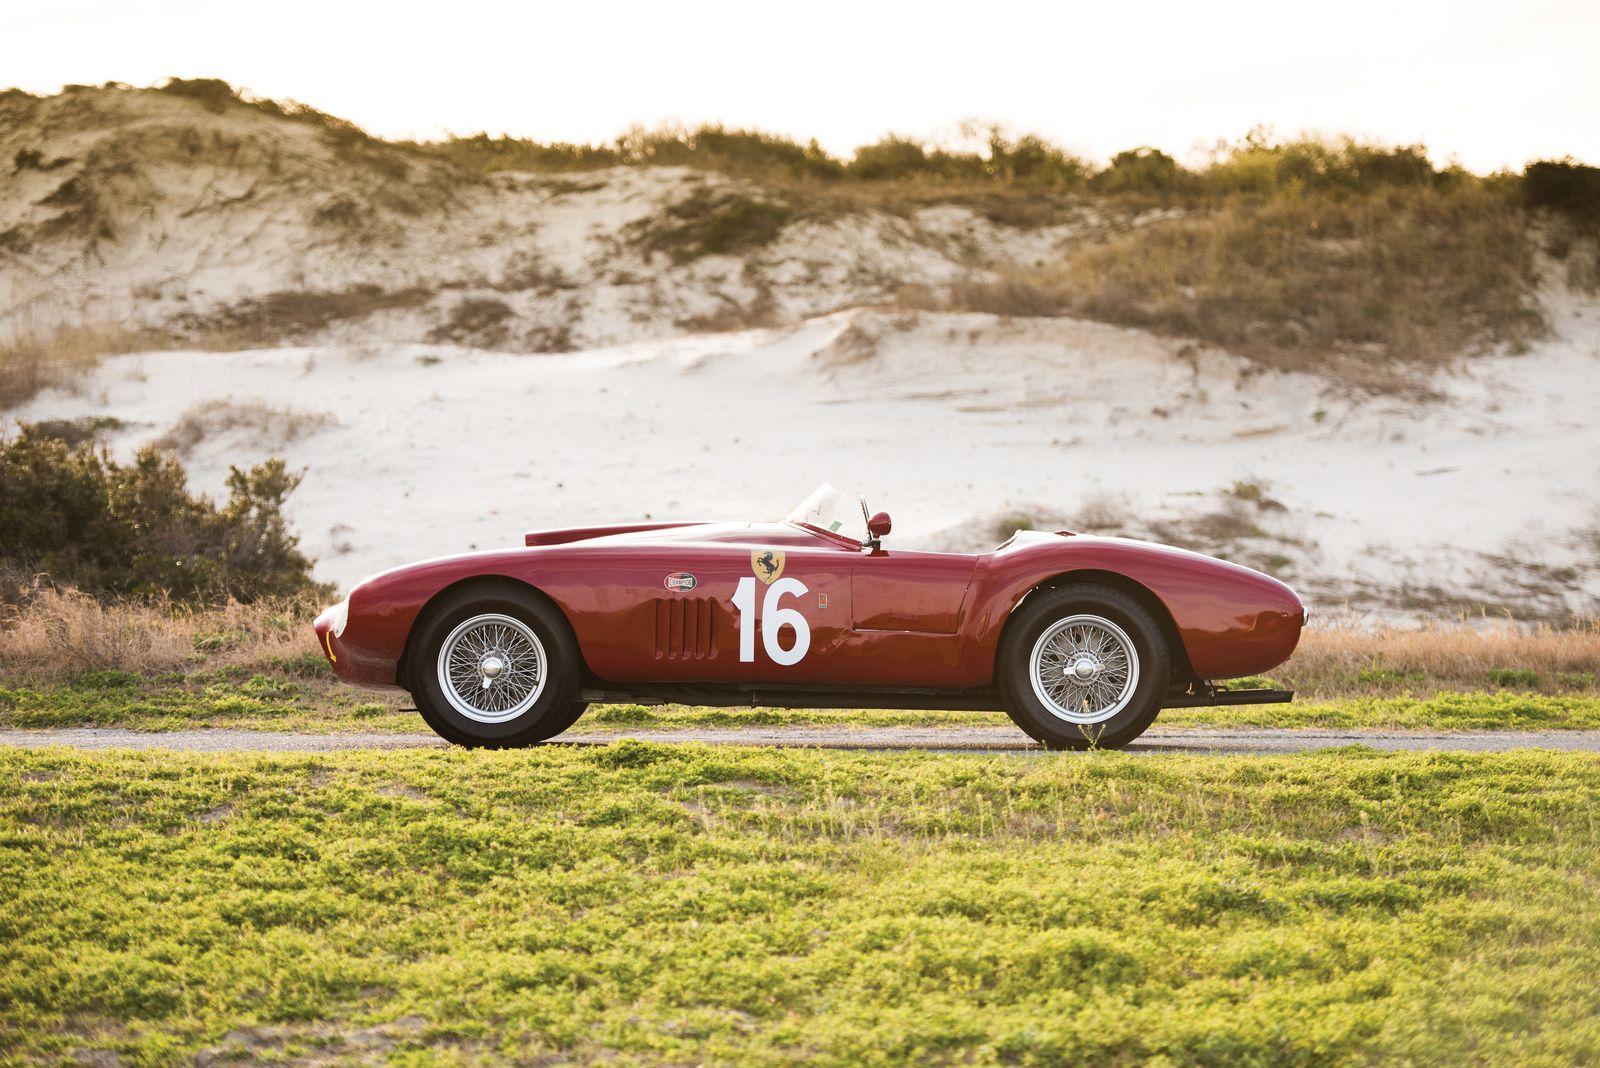 1950-Ferrari-275S-340-America-Barchetta-Goes-To-AUCTION-For-10-Million-10.jpg